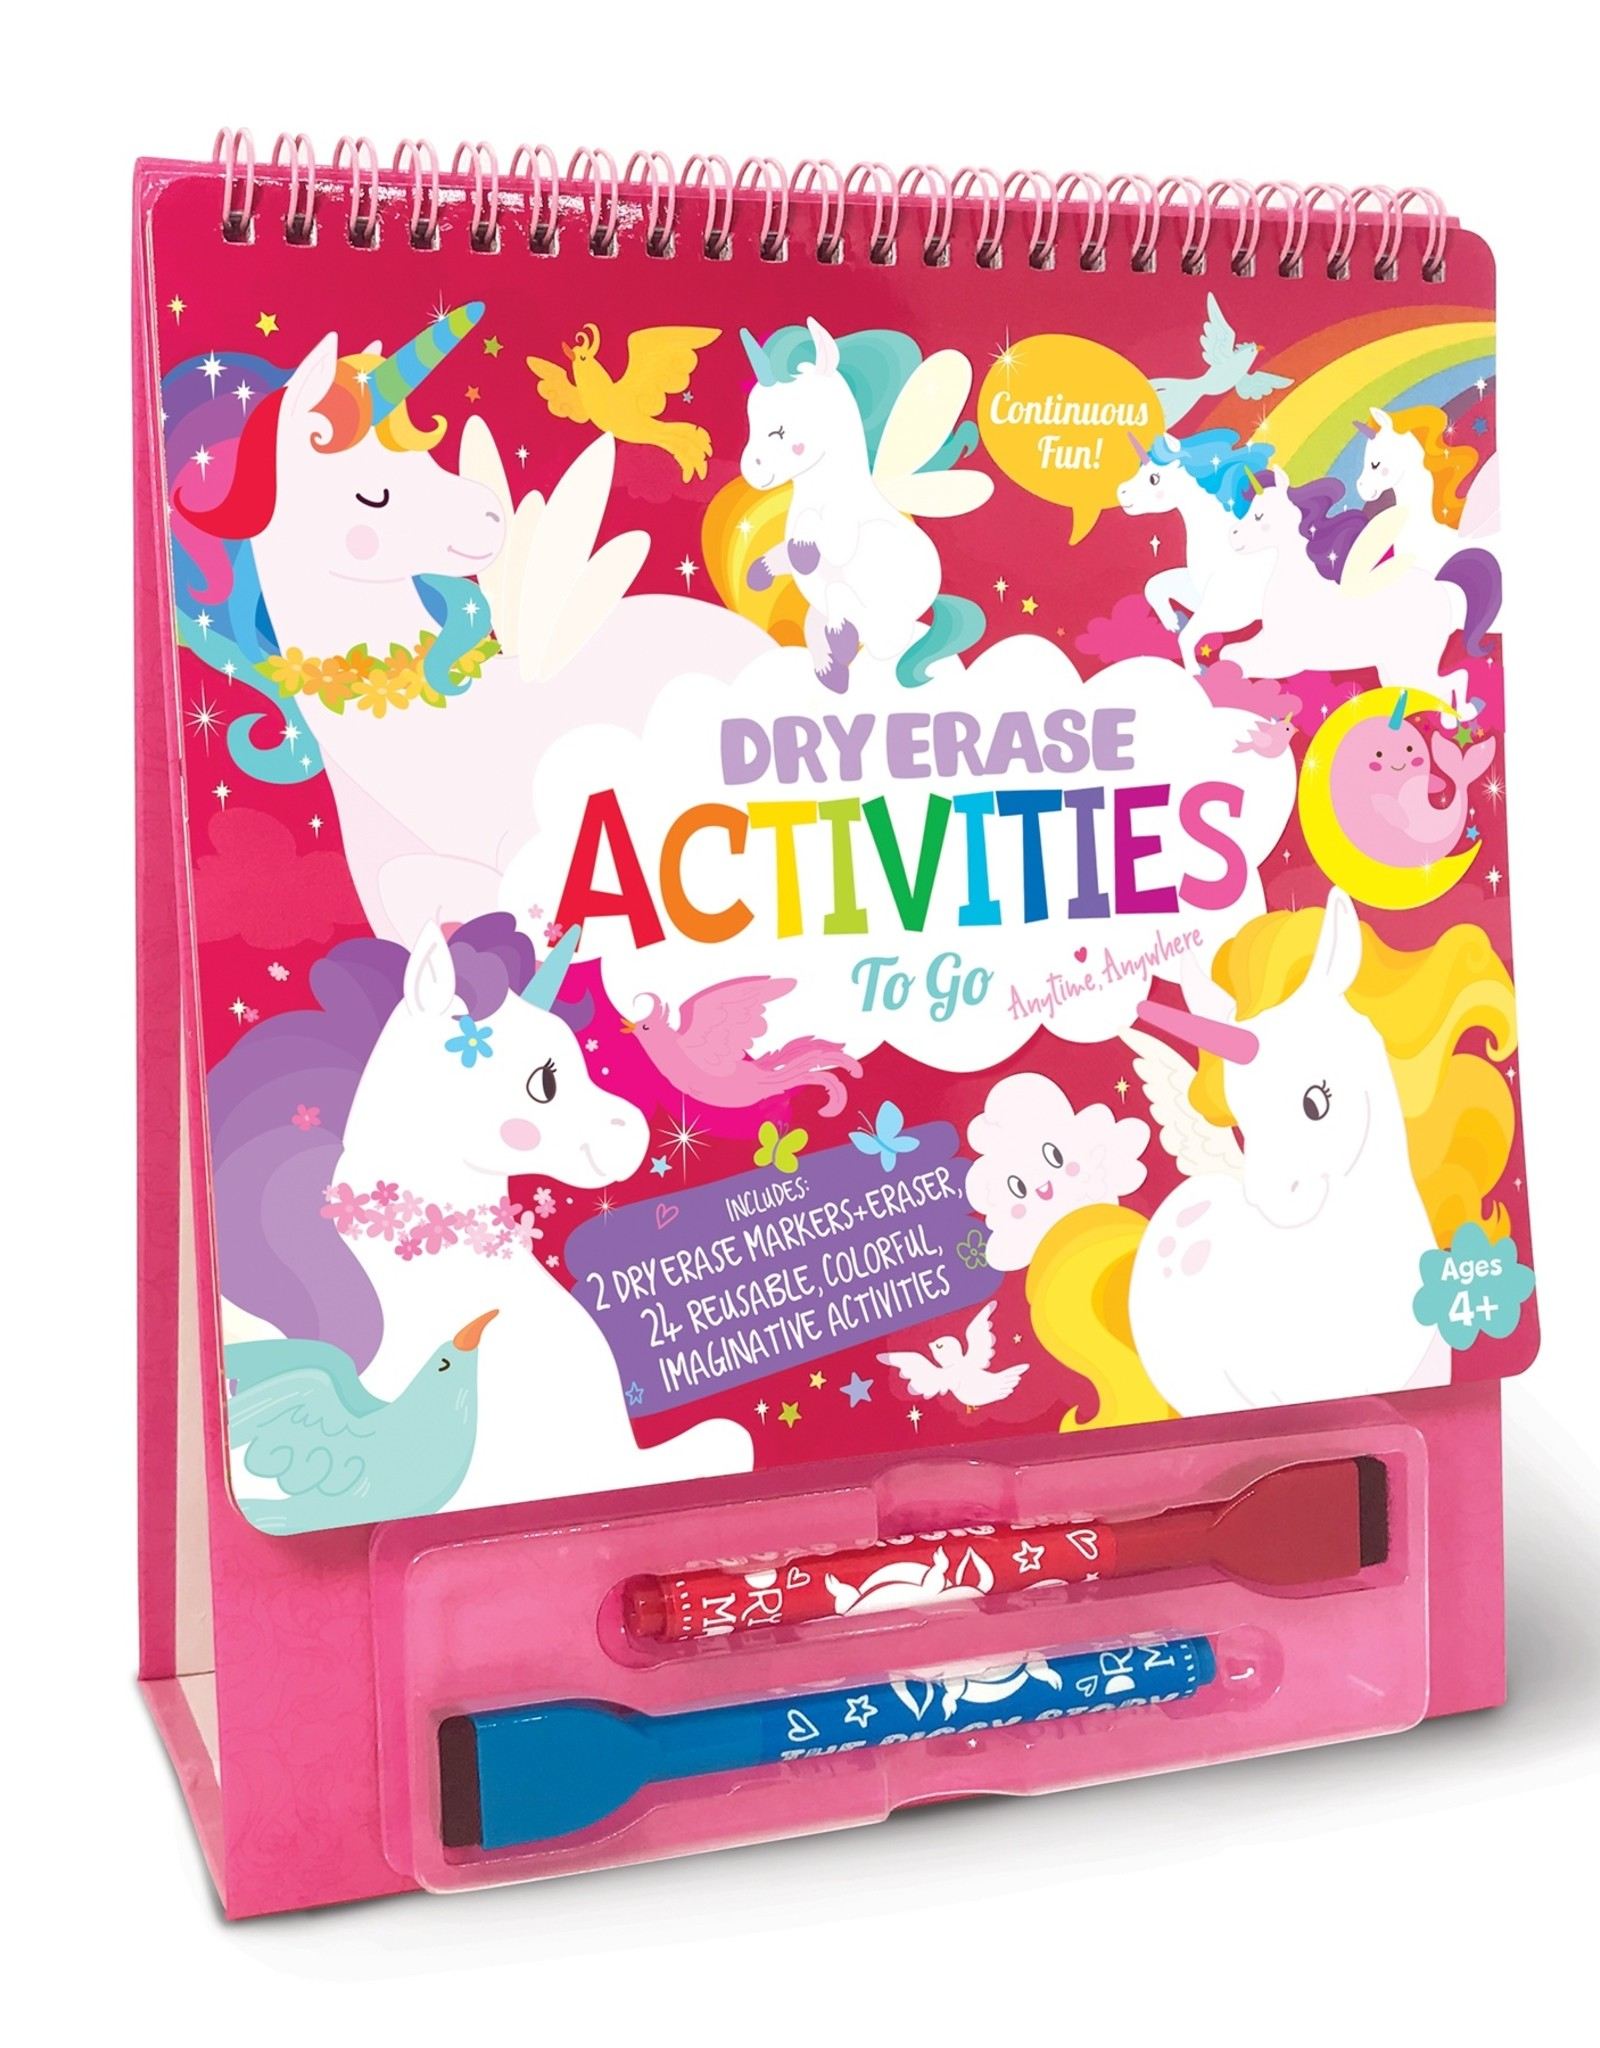 Faire Dry Erase Activities To Go